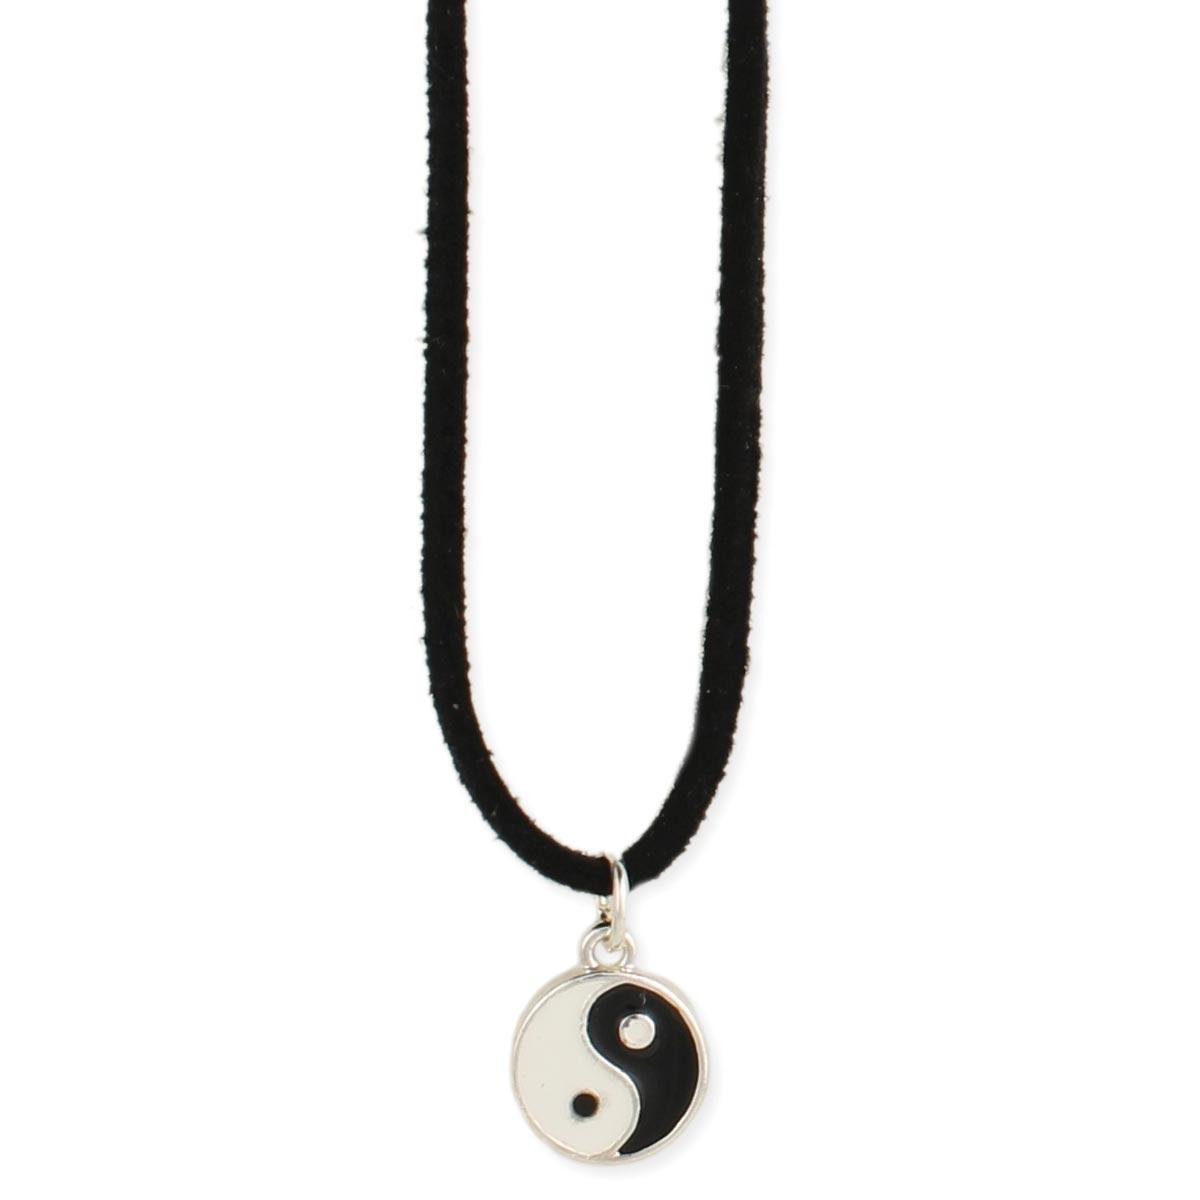 Black cord yin yang pendant necklace black cord yin yang pendant necklace view detailed images 2 aloadofball Images